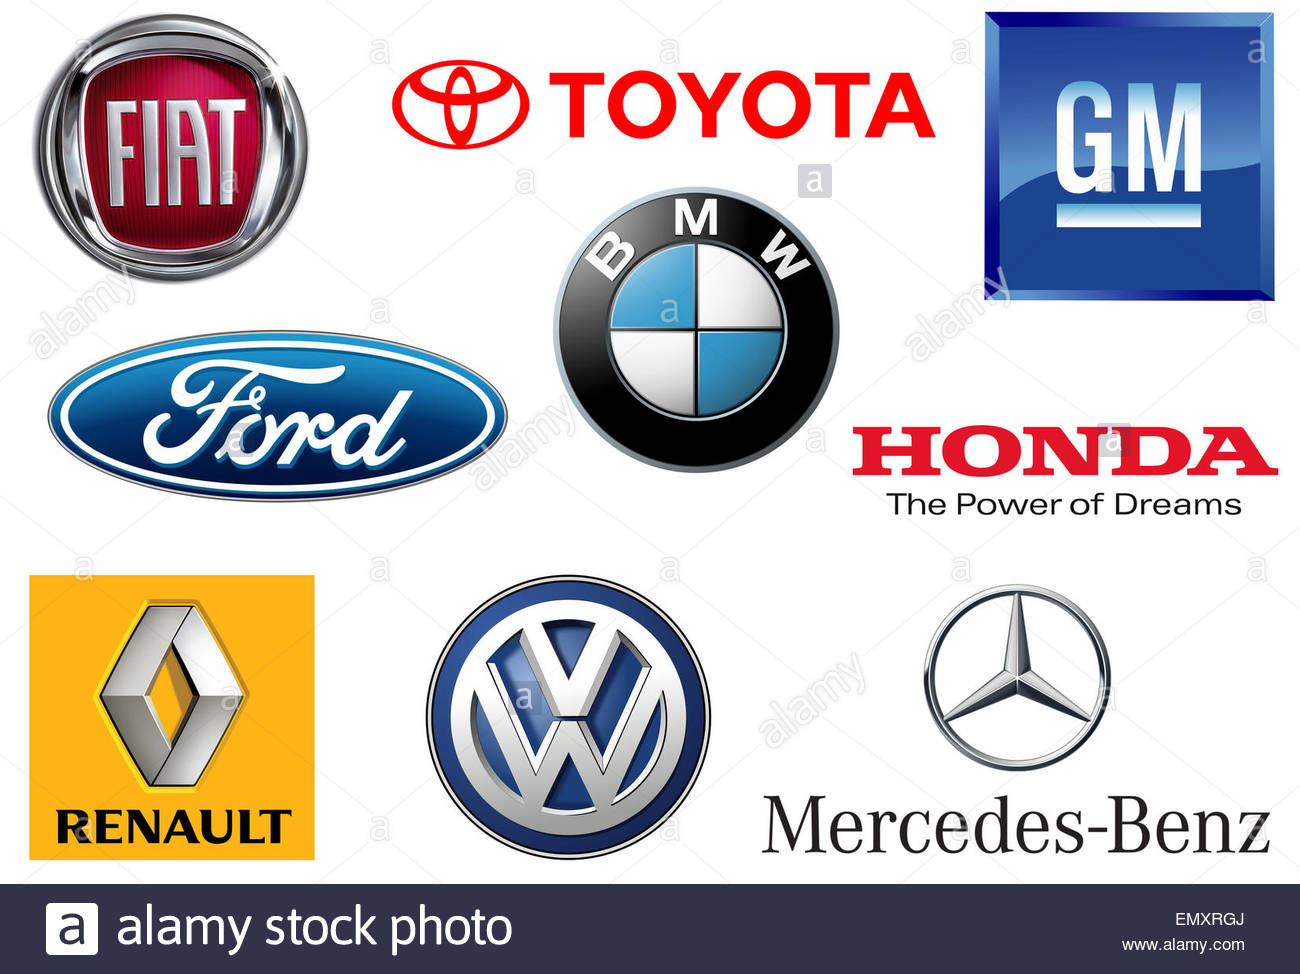 Toyota Volkswagen Gm General Motors Ford Bmw Mercedes